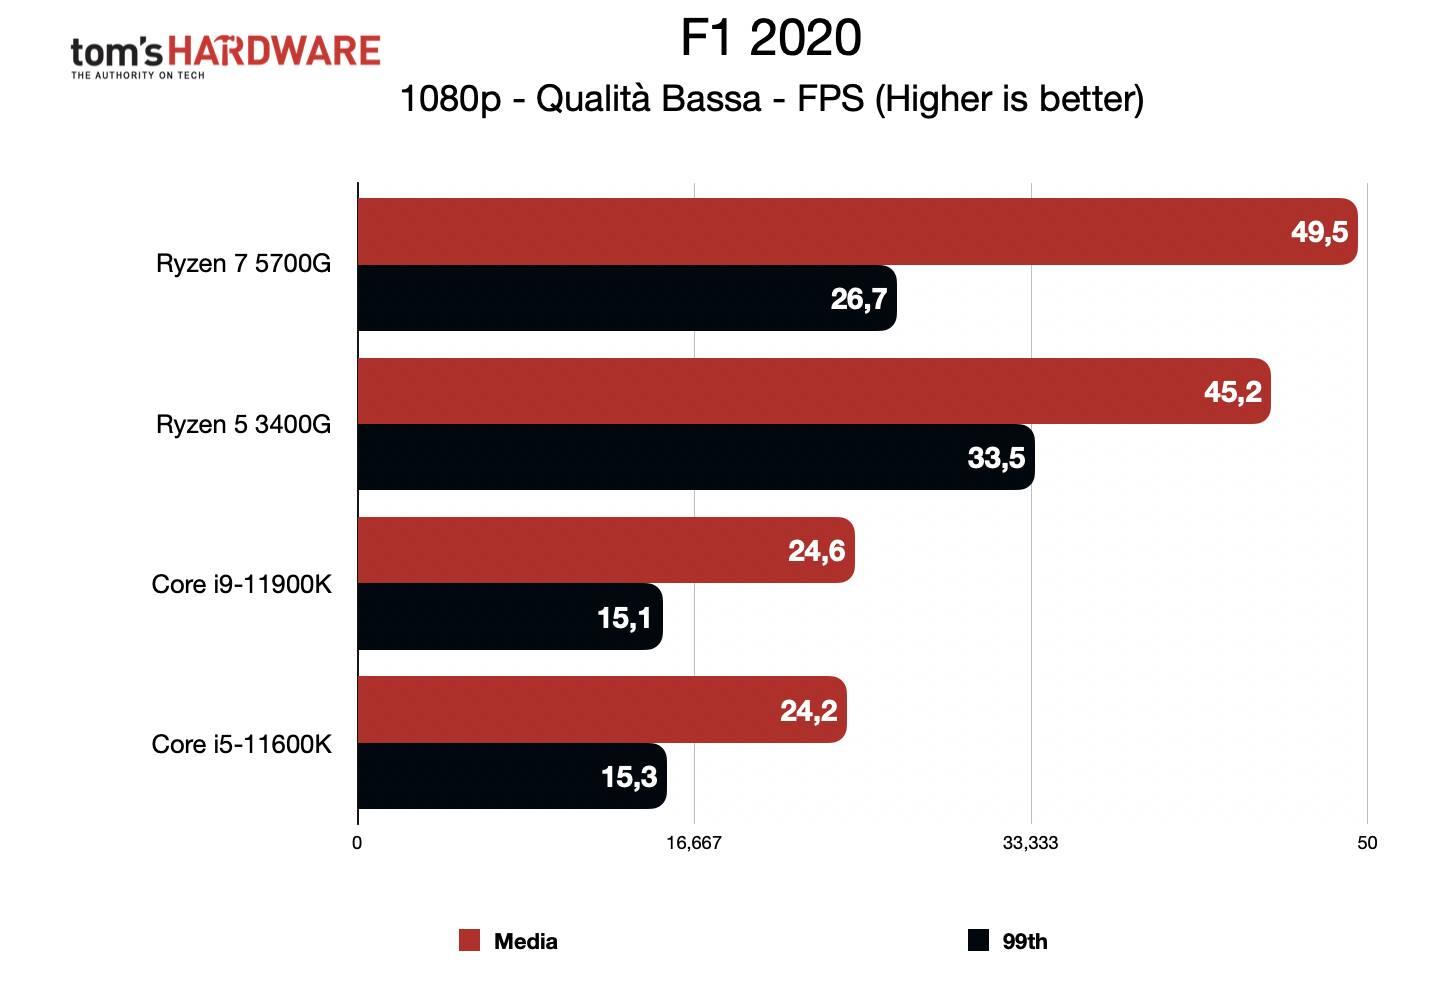 Benchmark Ryzen 7 5700G - Grafica integrata 1080p - F1 2020